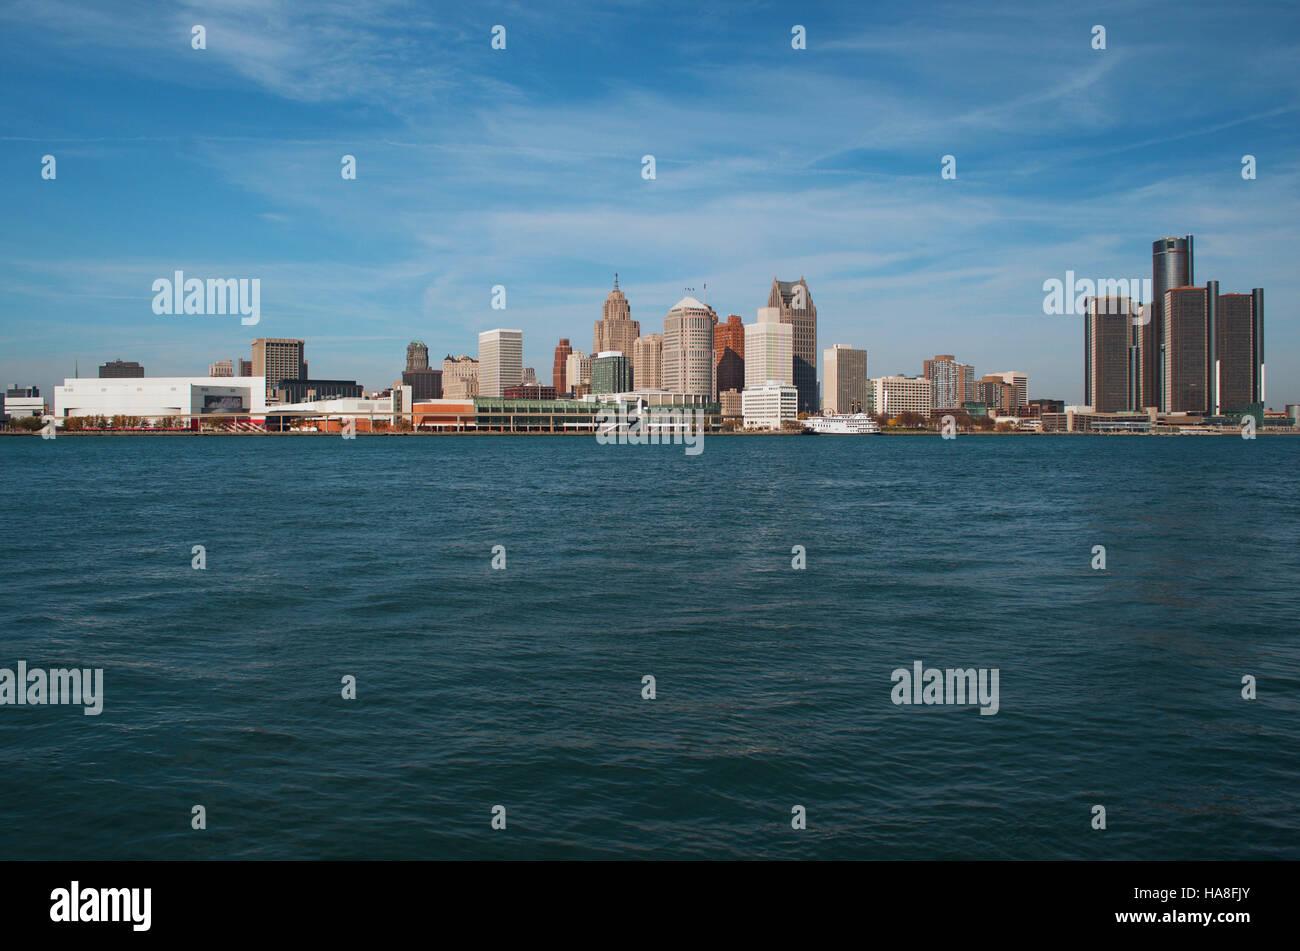 Detroit, Michigan Panoramic View Of The Skyline November 2016 - Stock Image